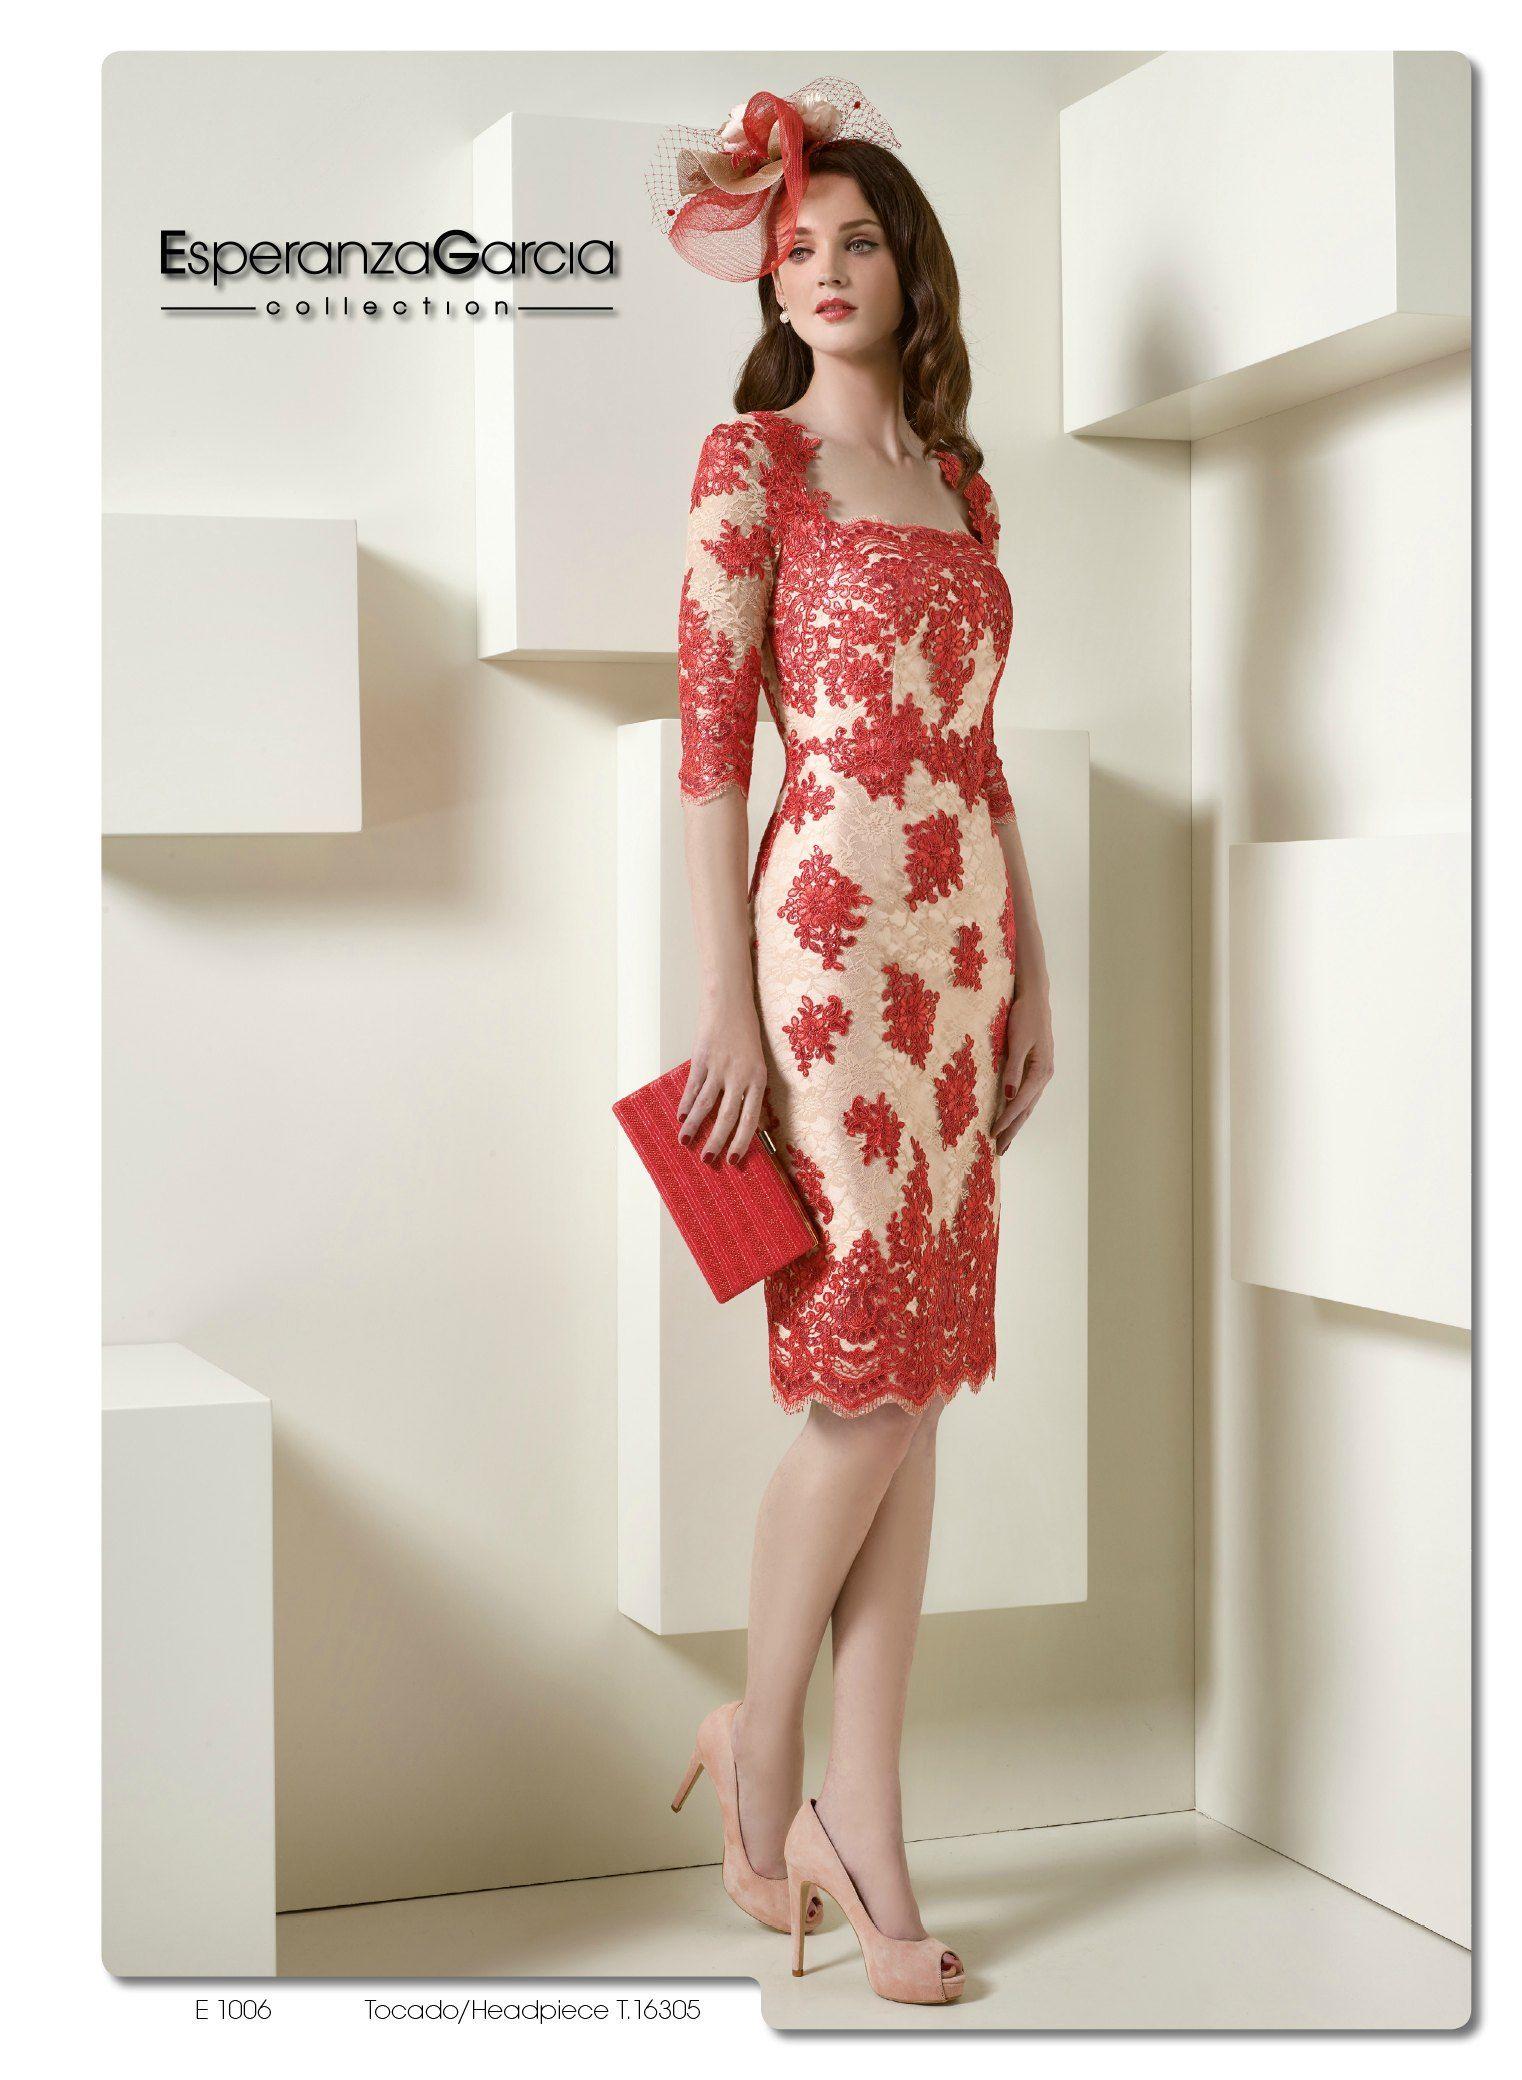 f4bbda234 vestido de fiesta esperanza garcia (2)